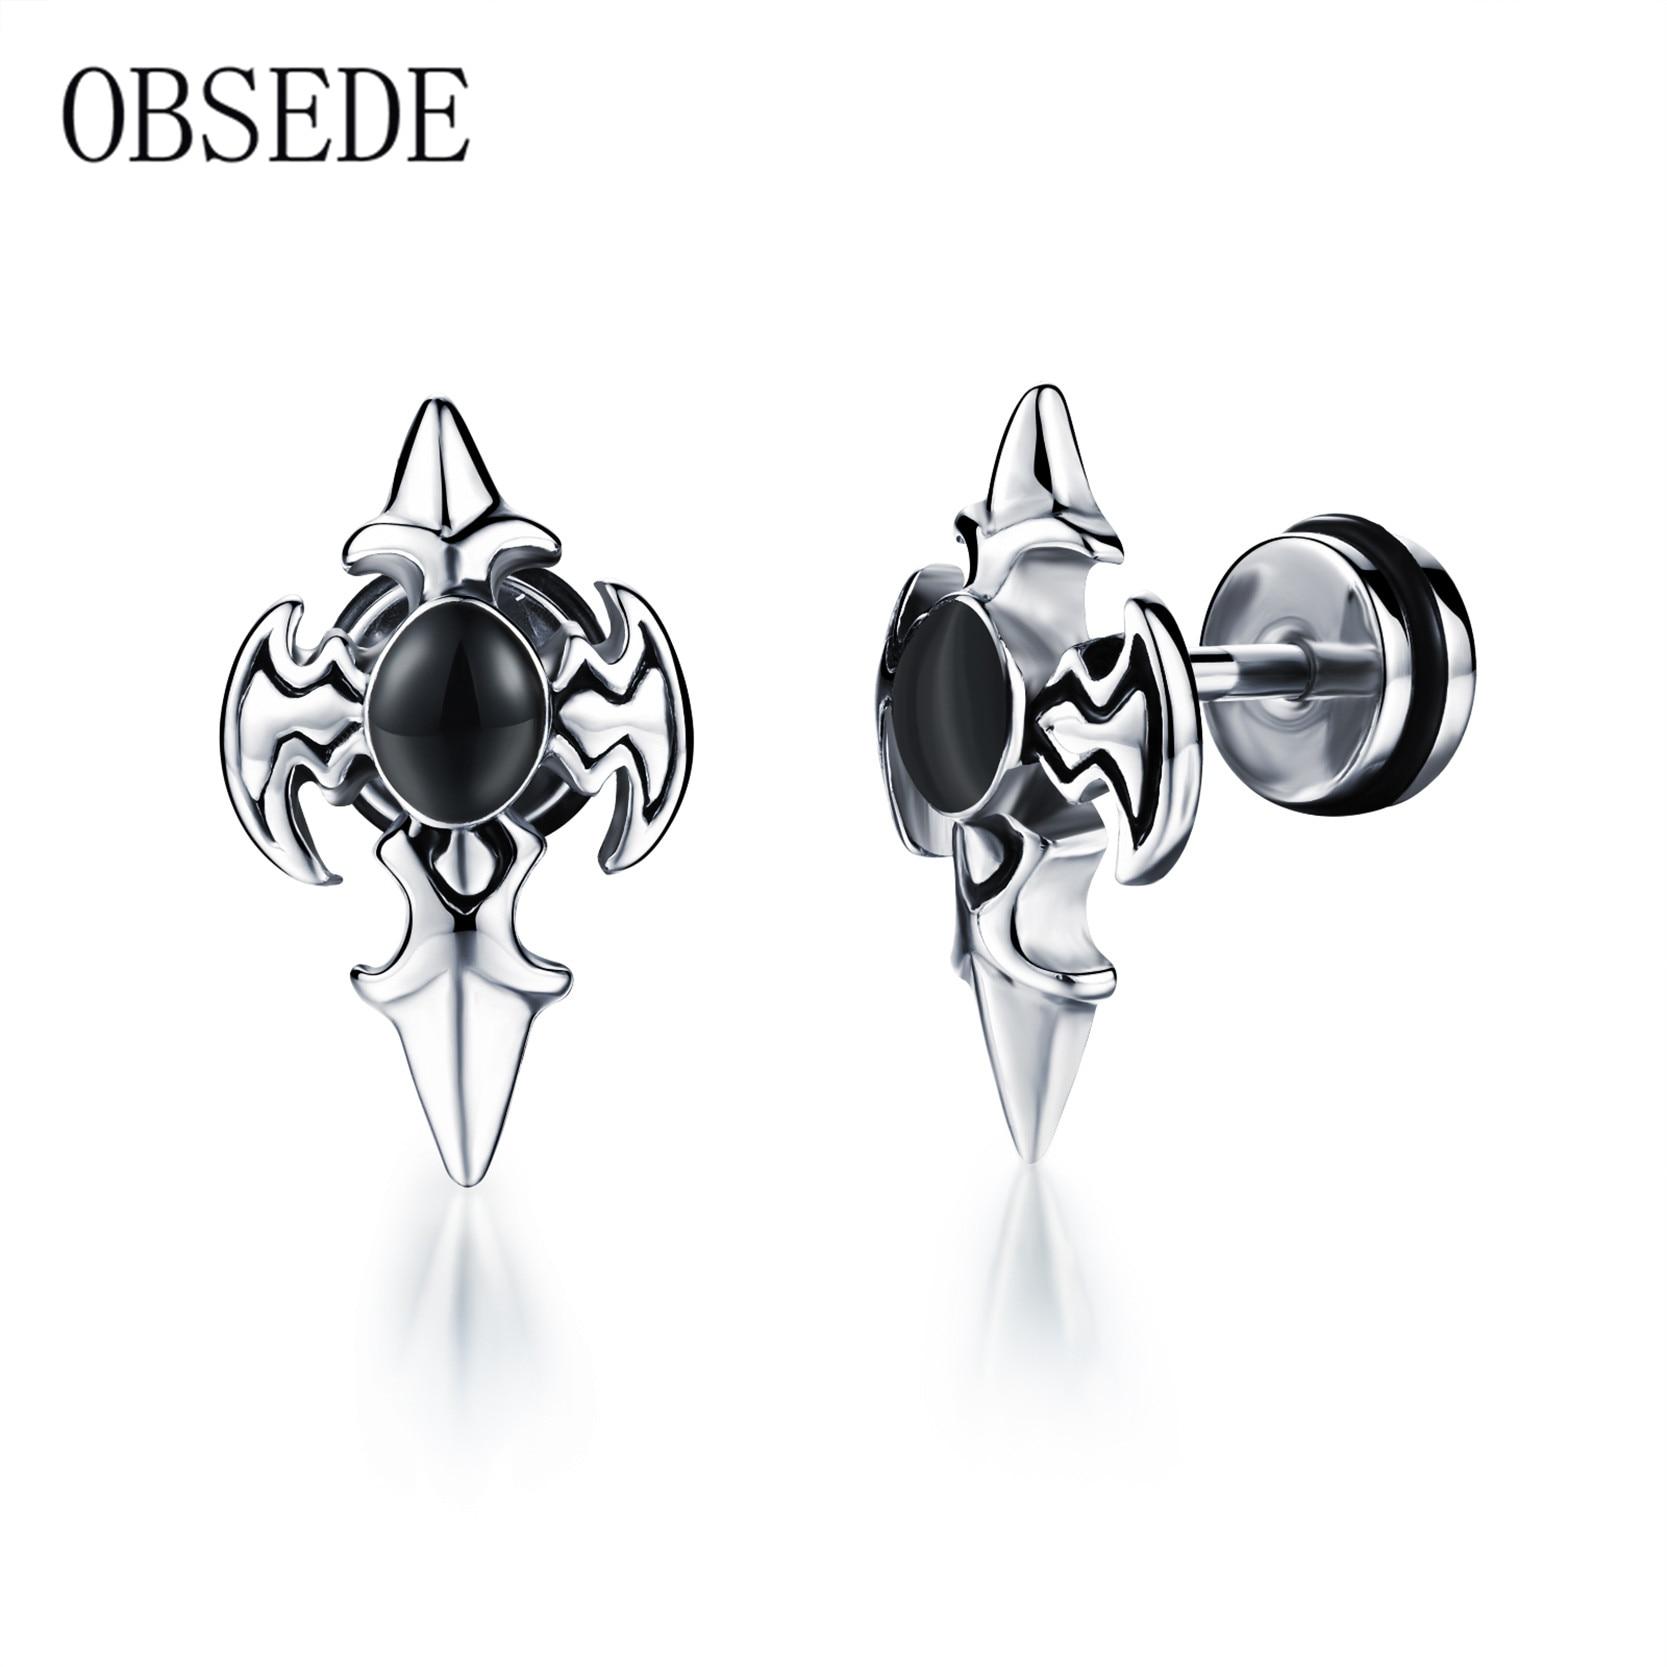 Obsede Vintage Punk Sword Cross Stud Earrings Stainless Steel Earring For  Men Silver Color Black Bead Best Jewelry Gift